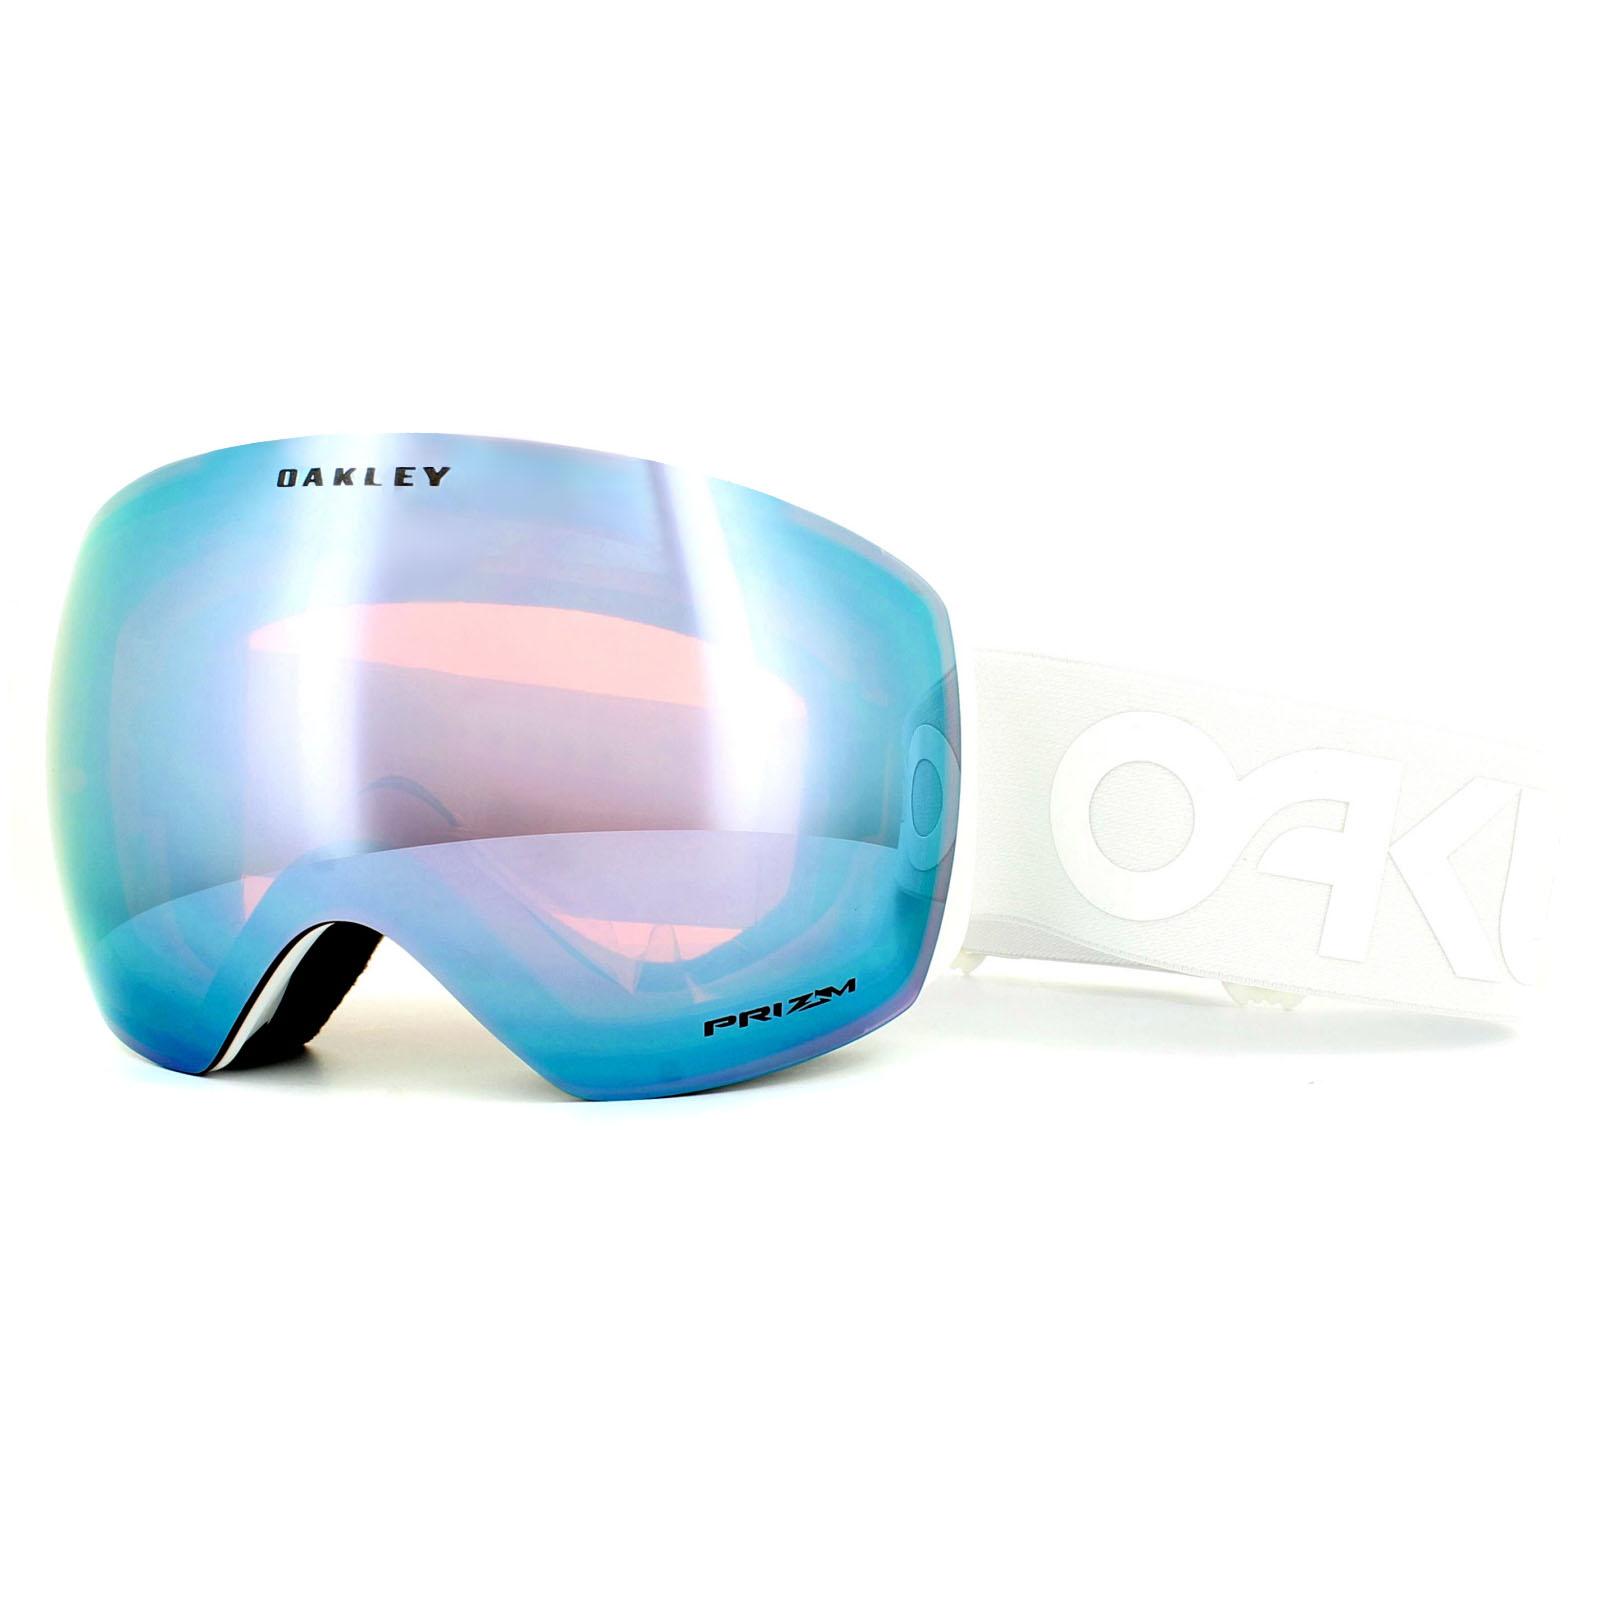 oakley pilot goggles  Oakley Ski Goggles Flight Deck OO7050-37 Factory Whiteout Prizm ...